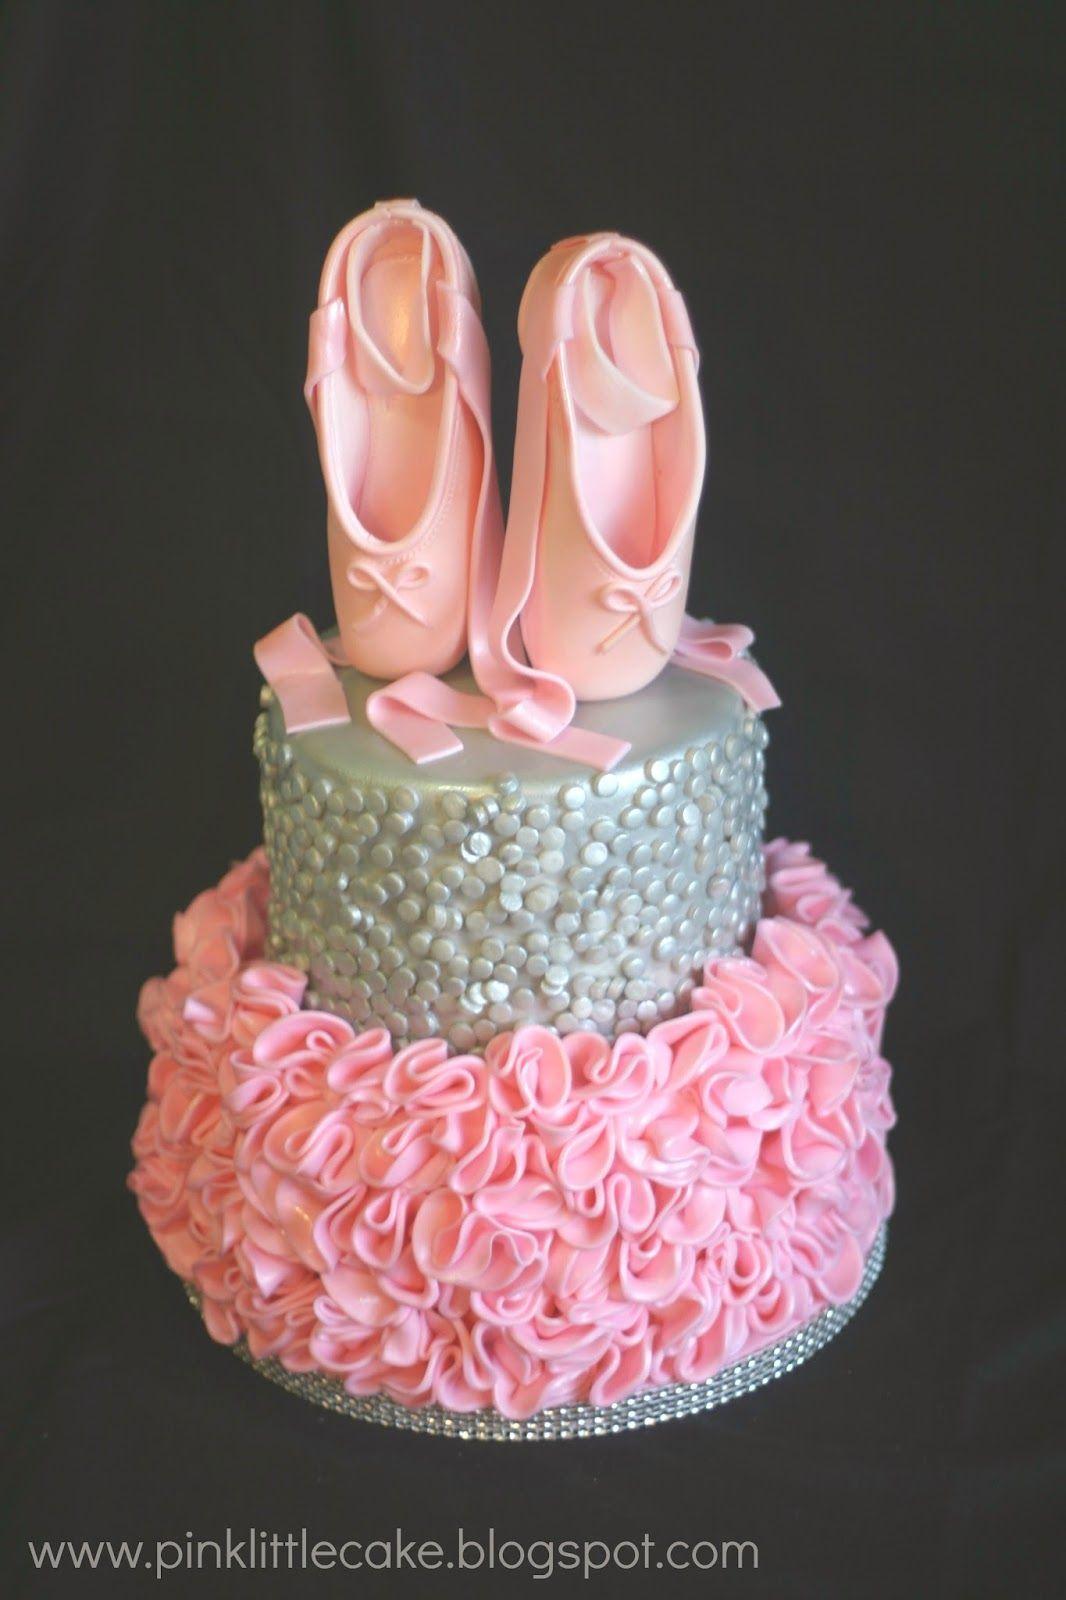 Pin by marili scharrighuisen on ballet partytjie for Ballerina cake decoration